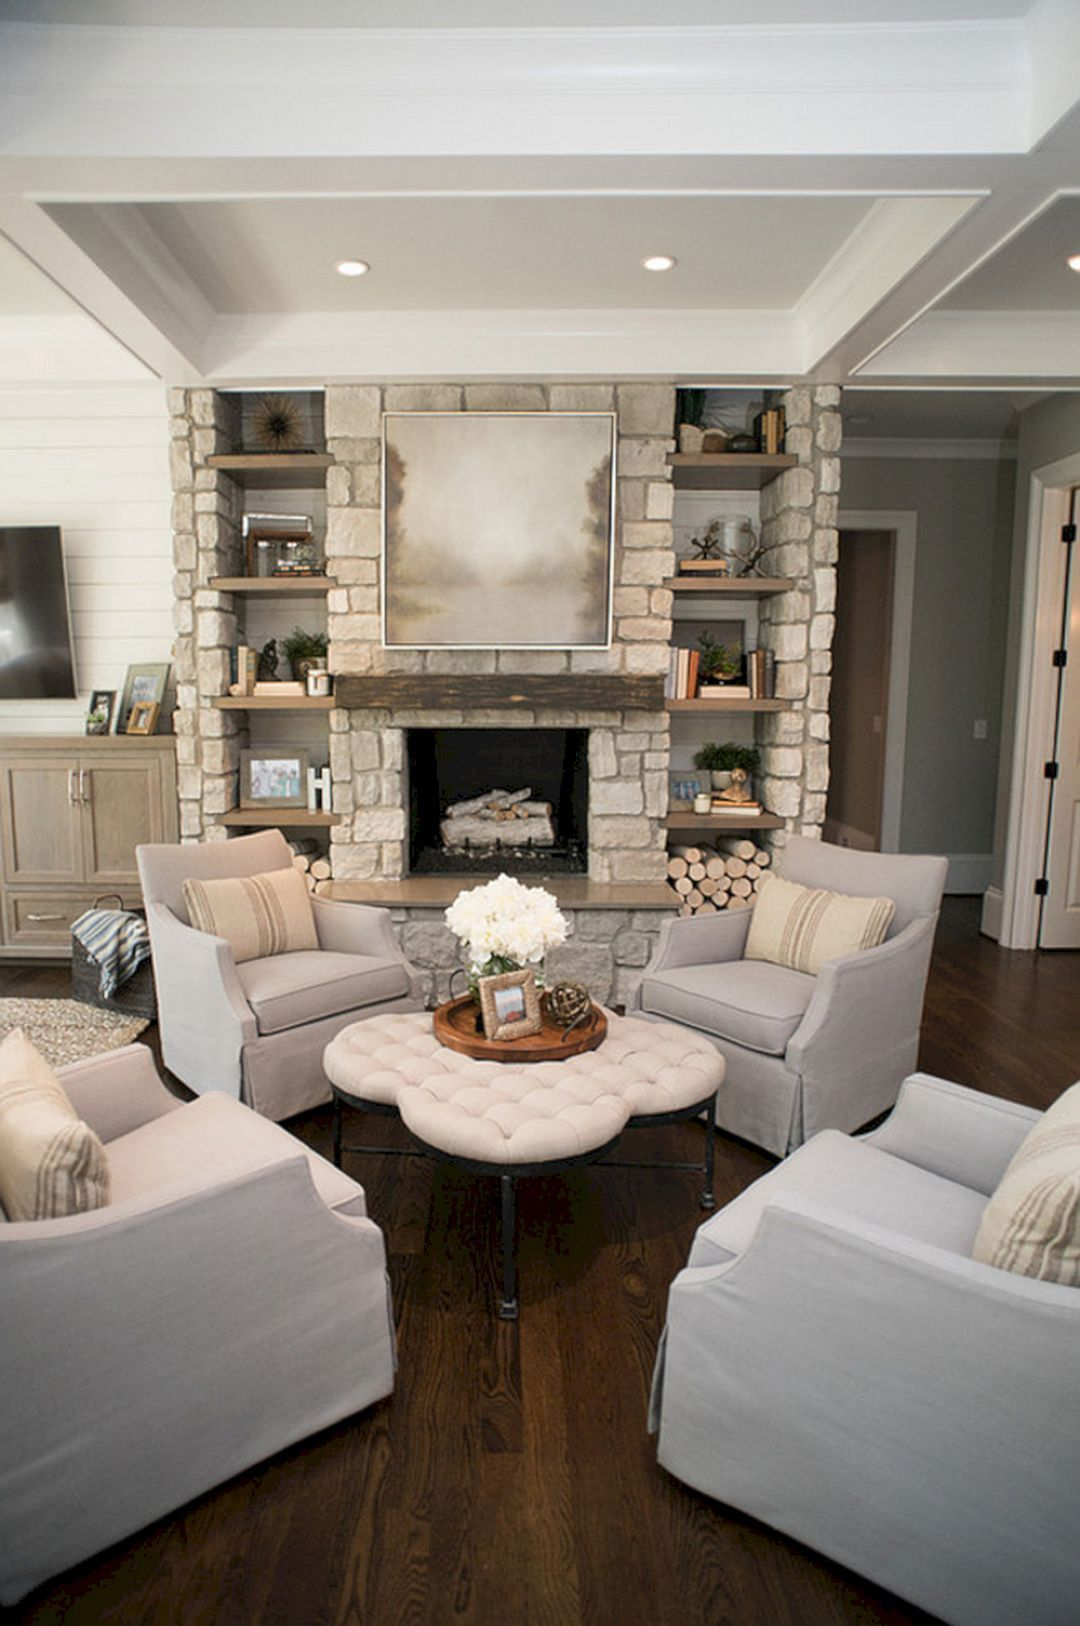 45 Awesome Accent Chair Ideas For Beautiful Living Room Freshouz Com Ruang Keluarga Ruang